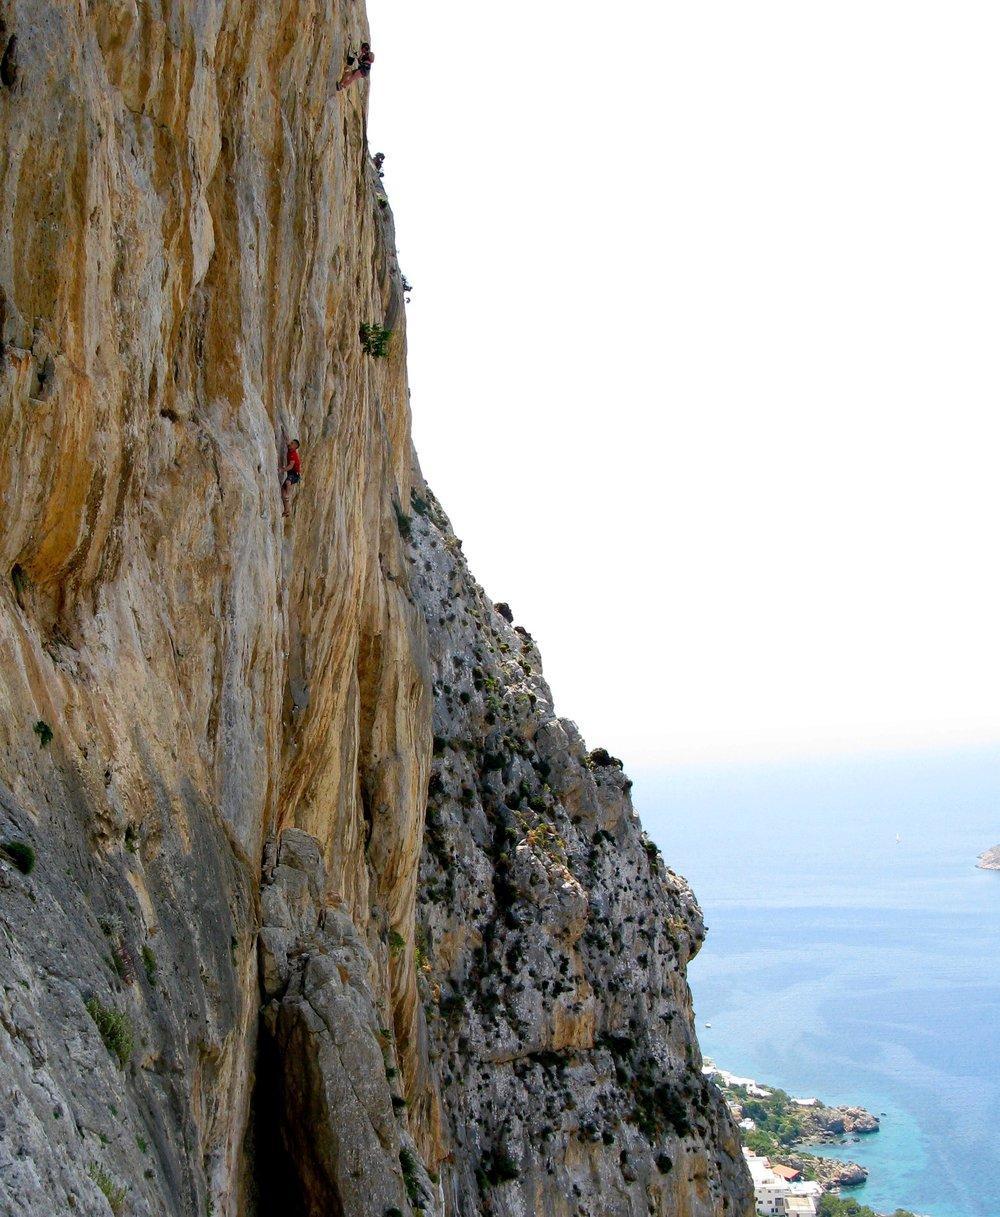 Fudoshin 7c+, Lower Spartan Wall, Kalymnos.  Photo: Selina Chen